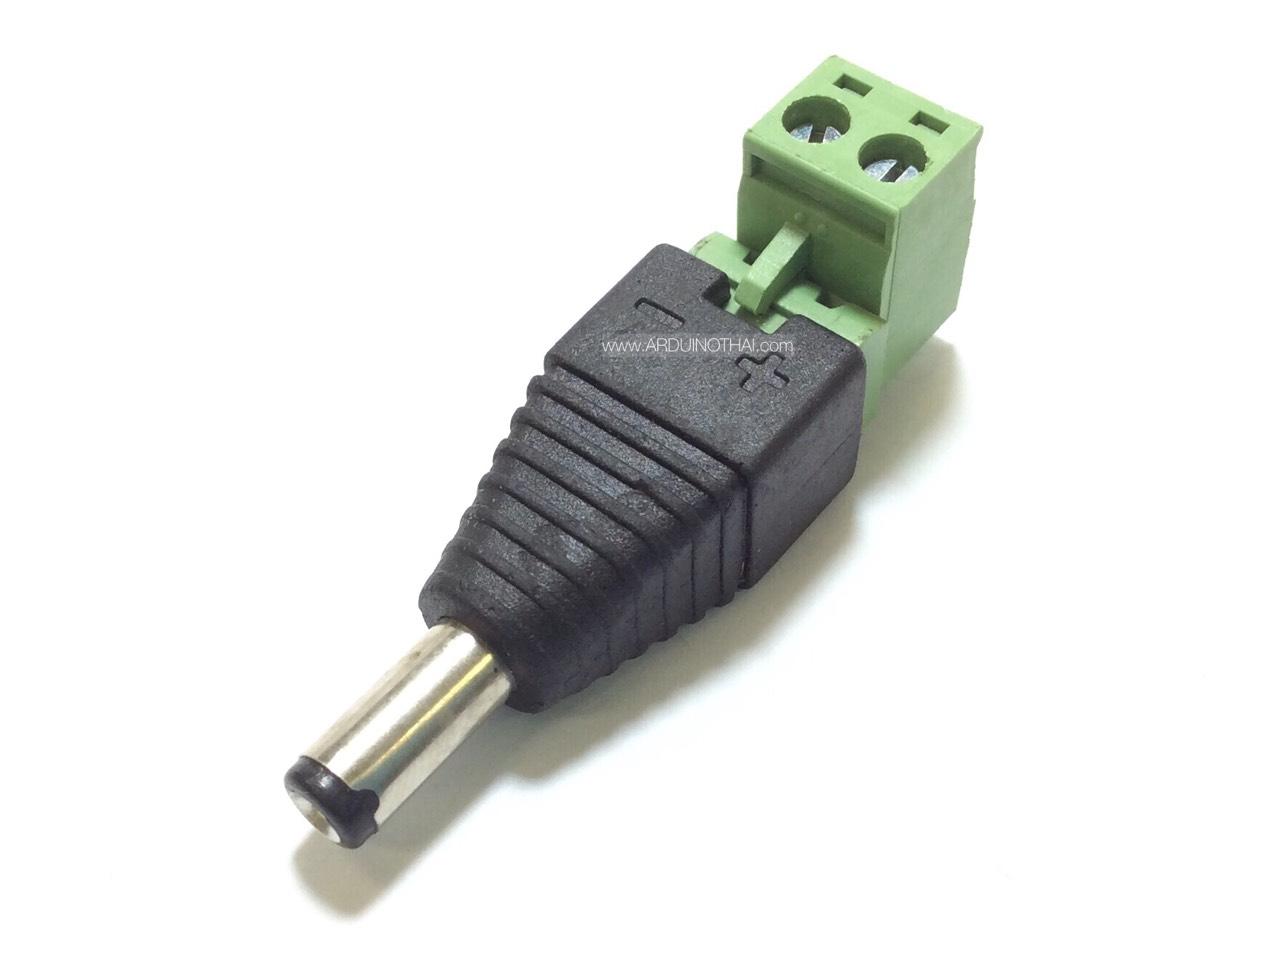 Adapter Jack with terminal สำหรับ Arduino